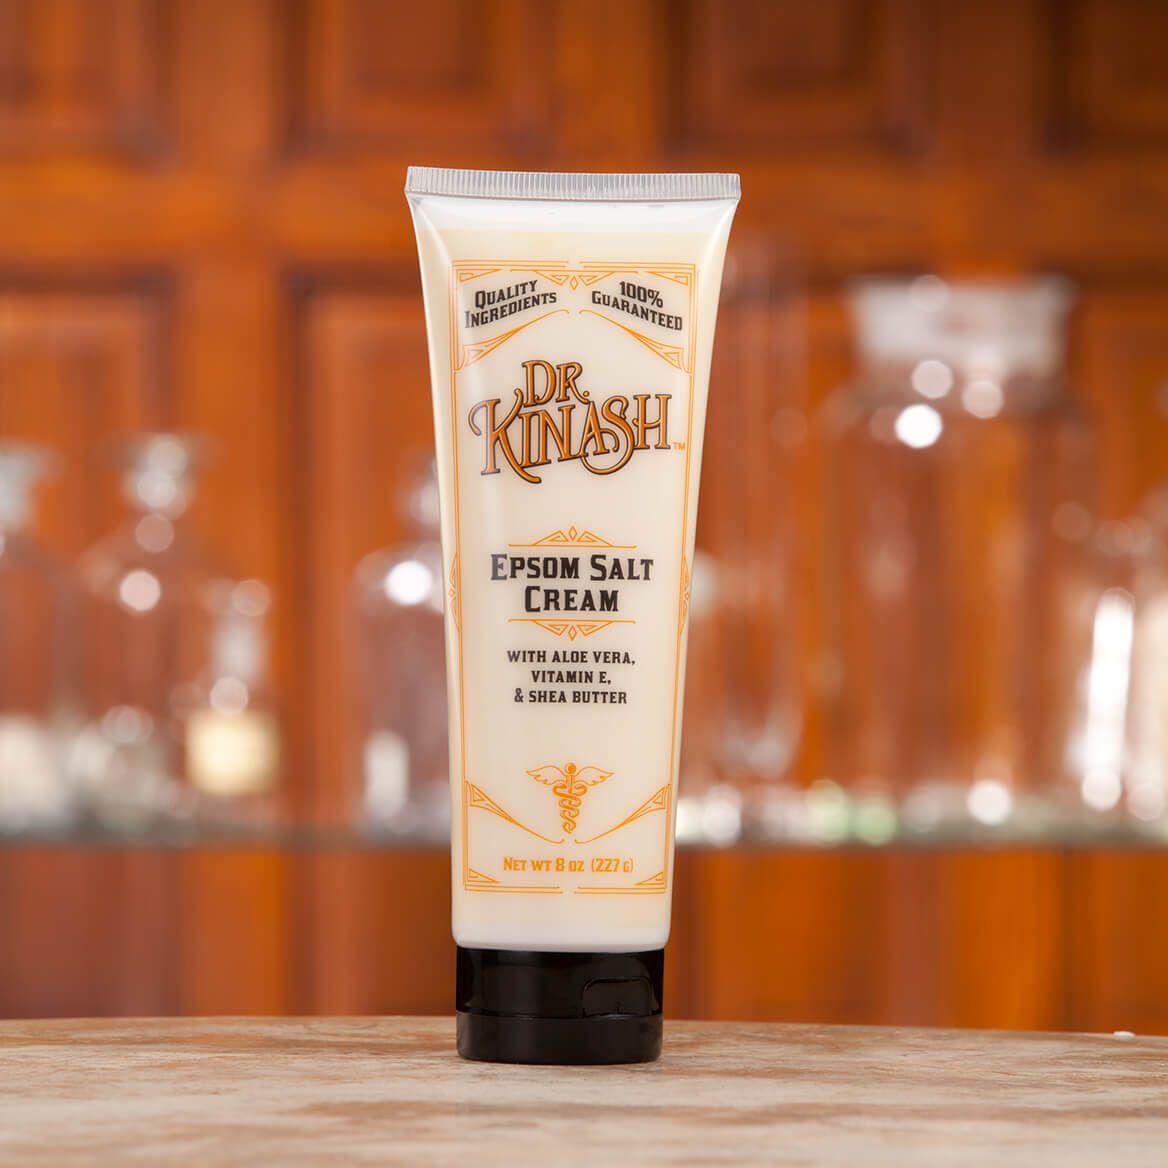 Dr. Kinash™ Epsom Salt Cream 8 oz., Set of 2-368908